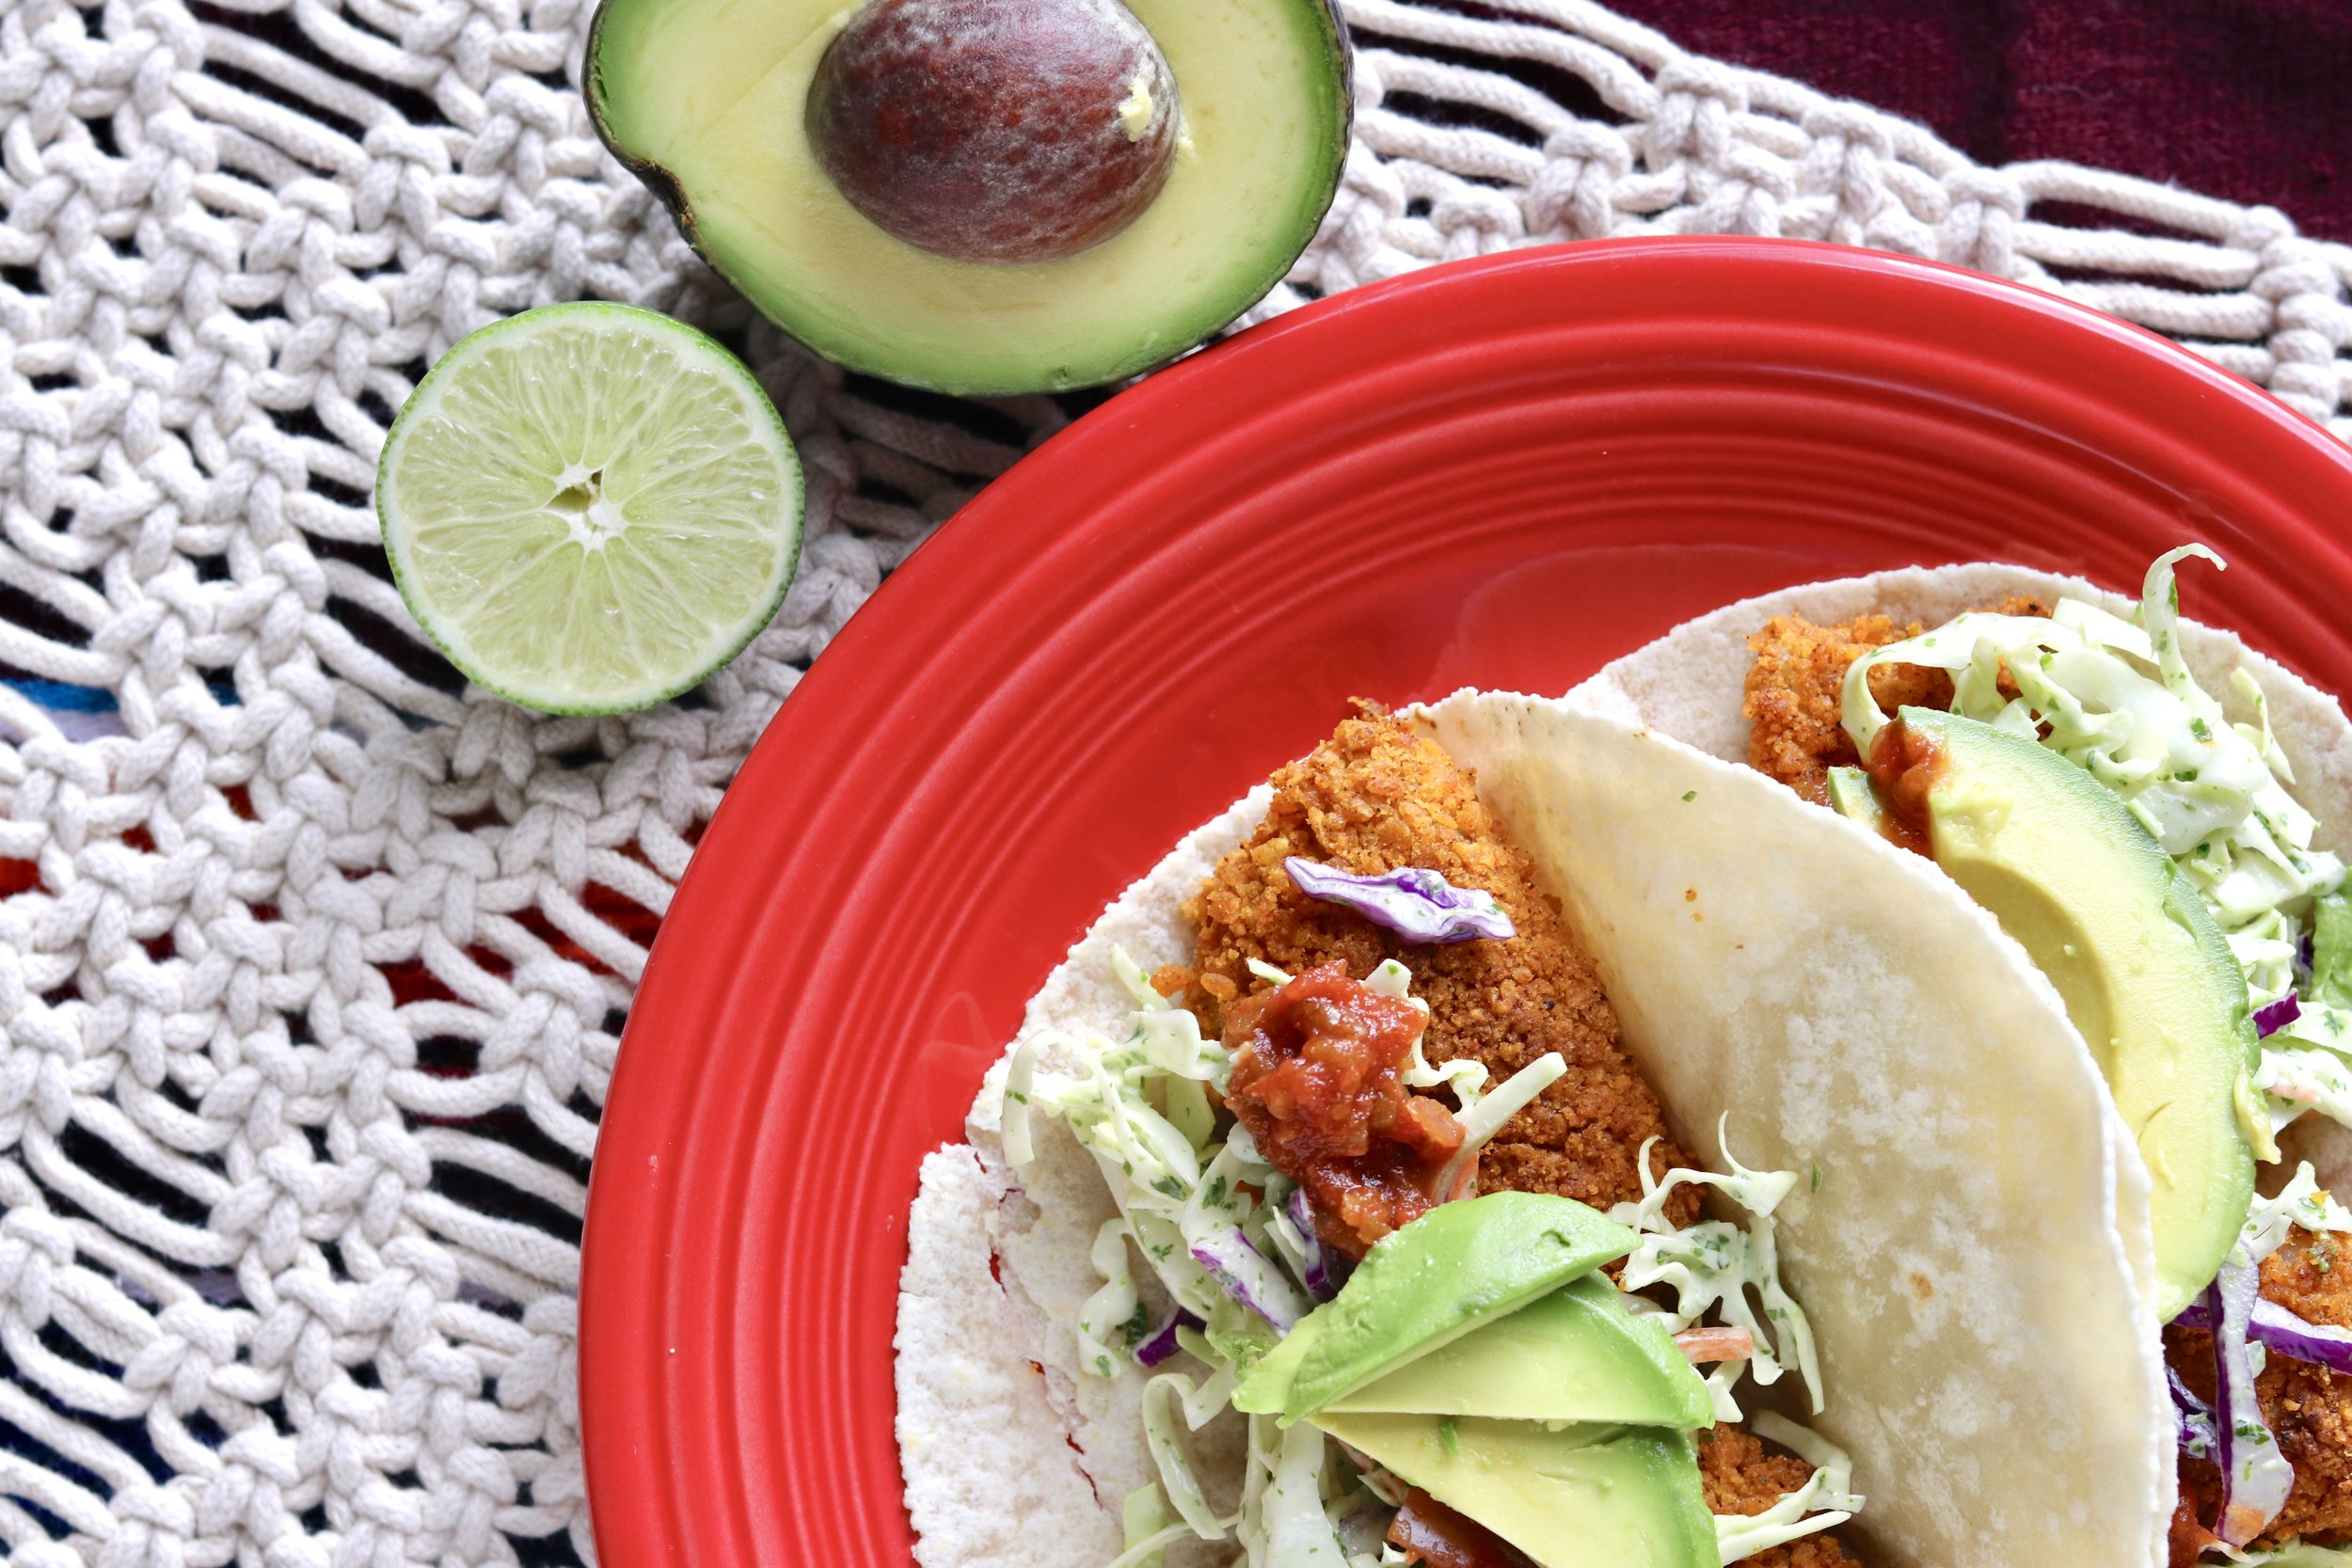 Crispy Fish Tacos with Cilantro Lime Slaw